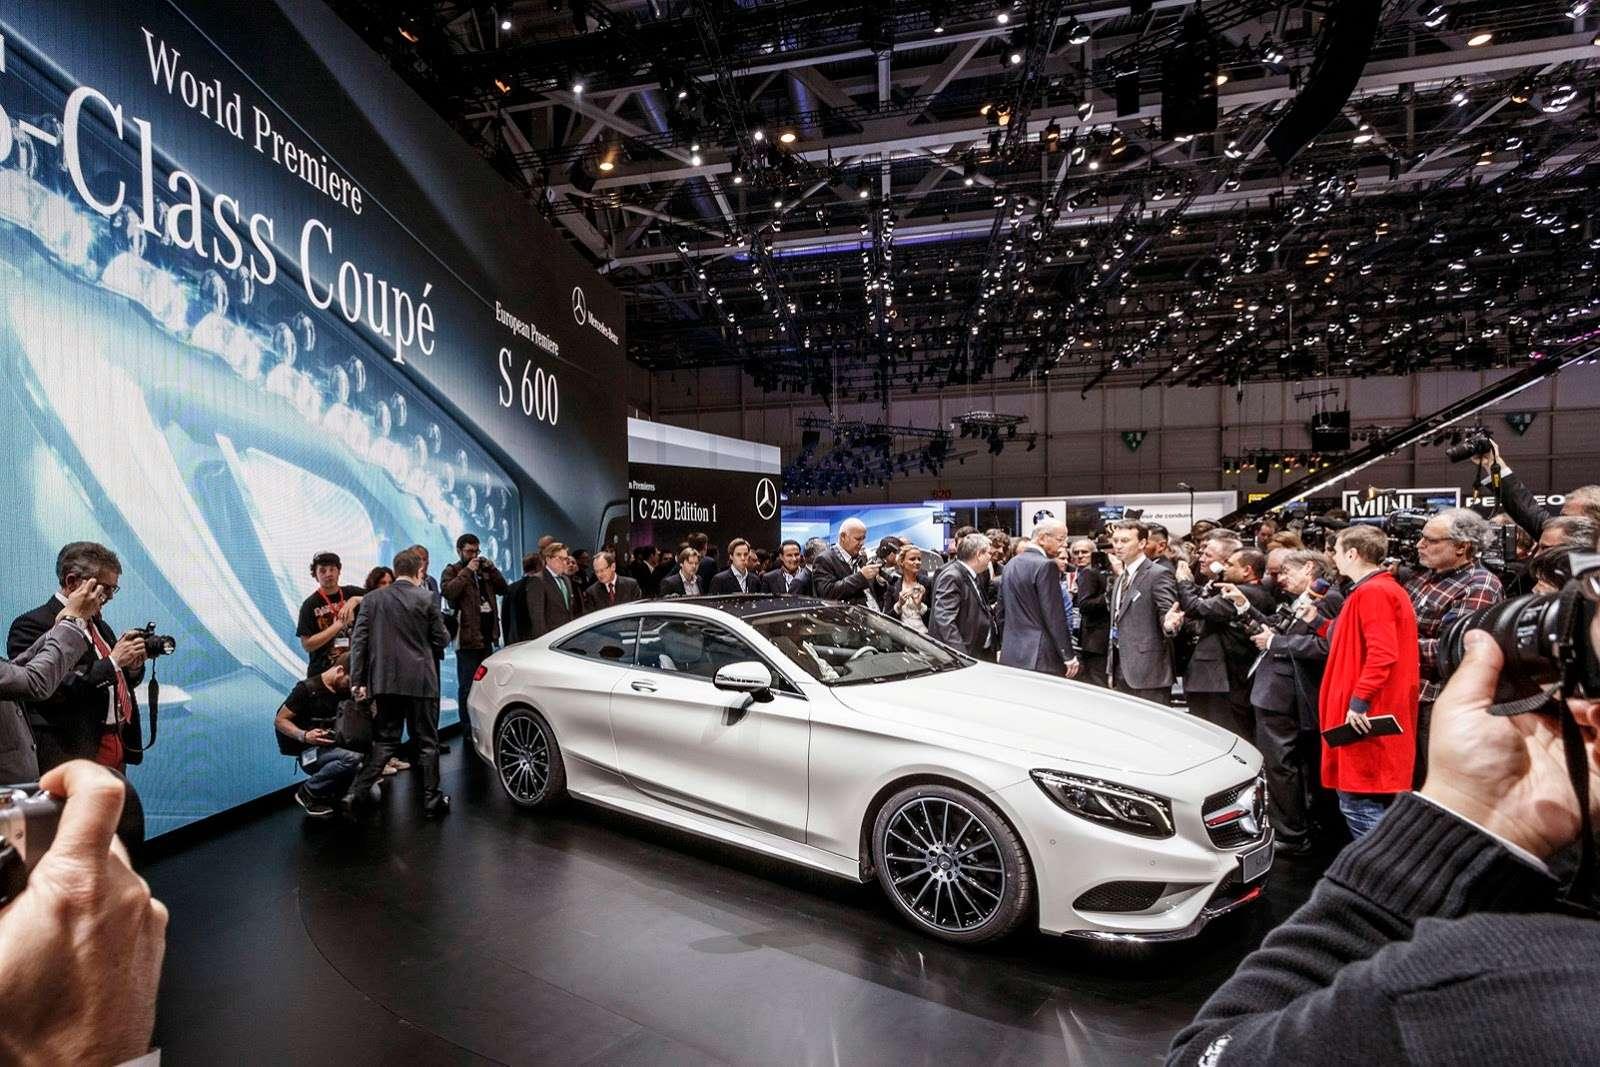 Mercedes Klasy S Coupe Geneva 2014